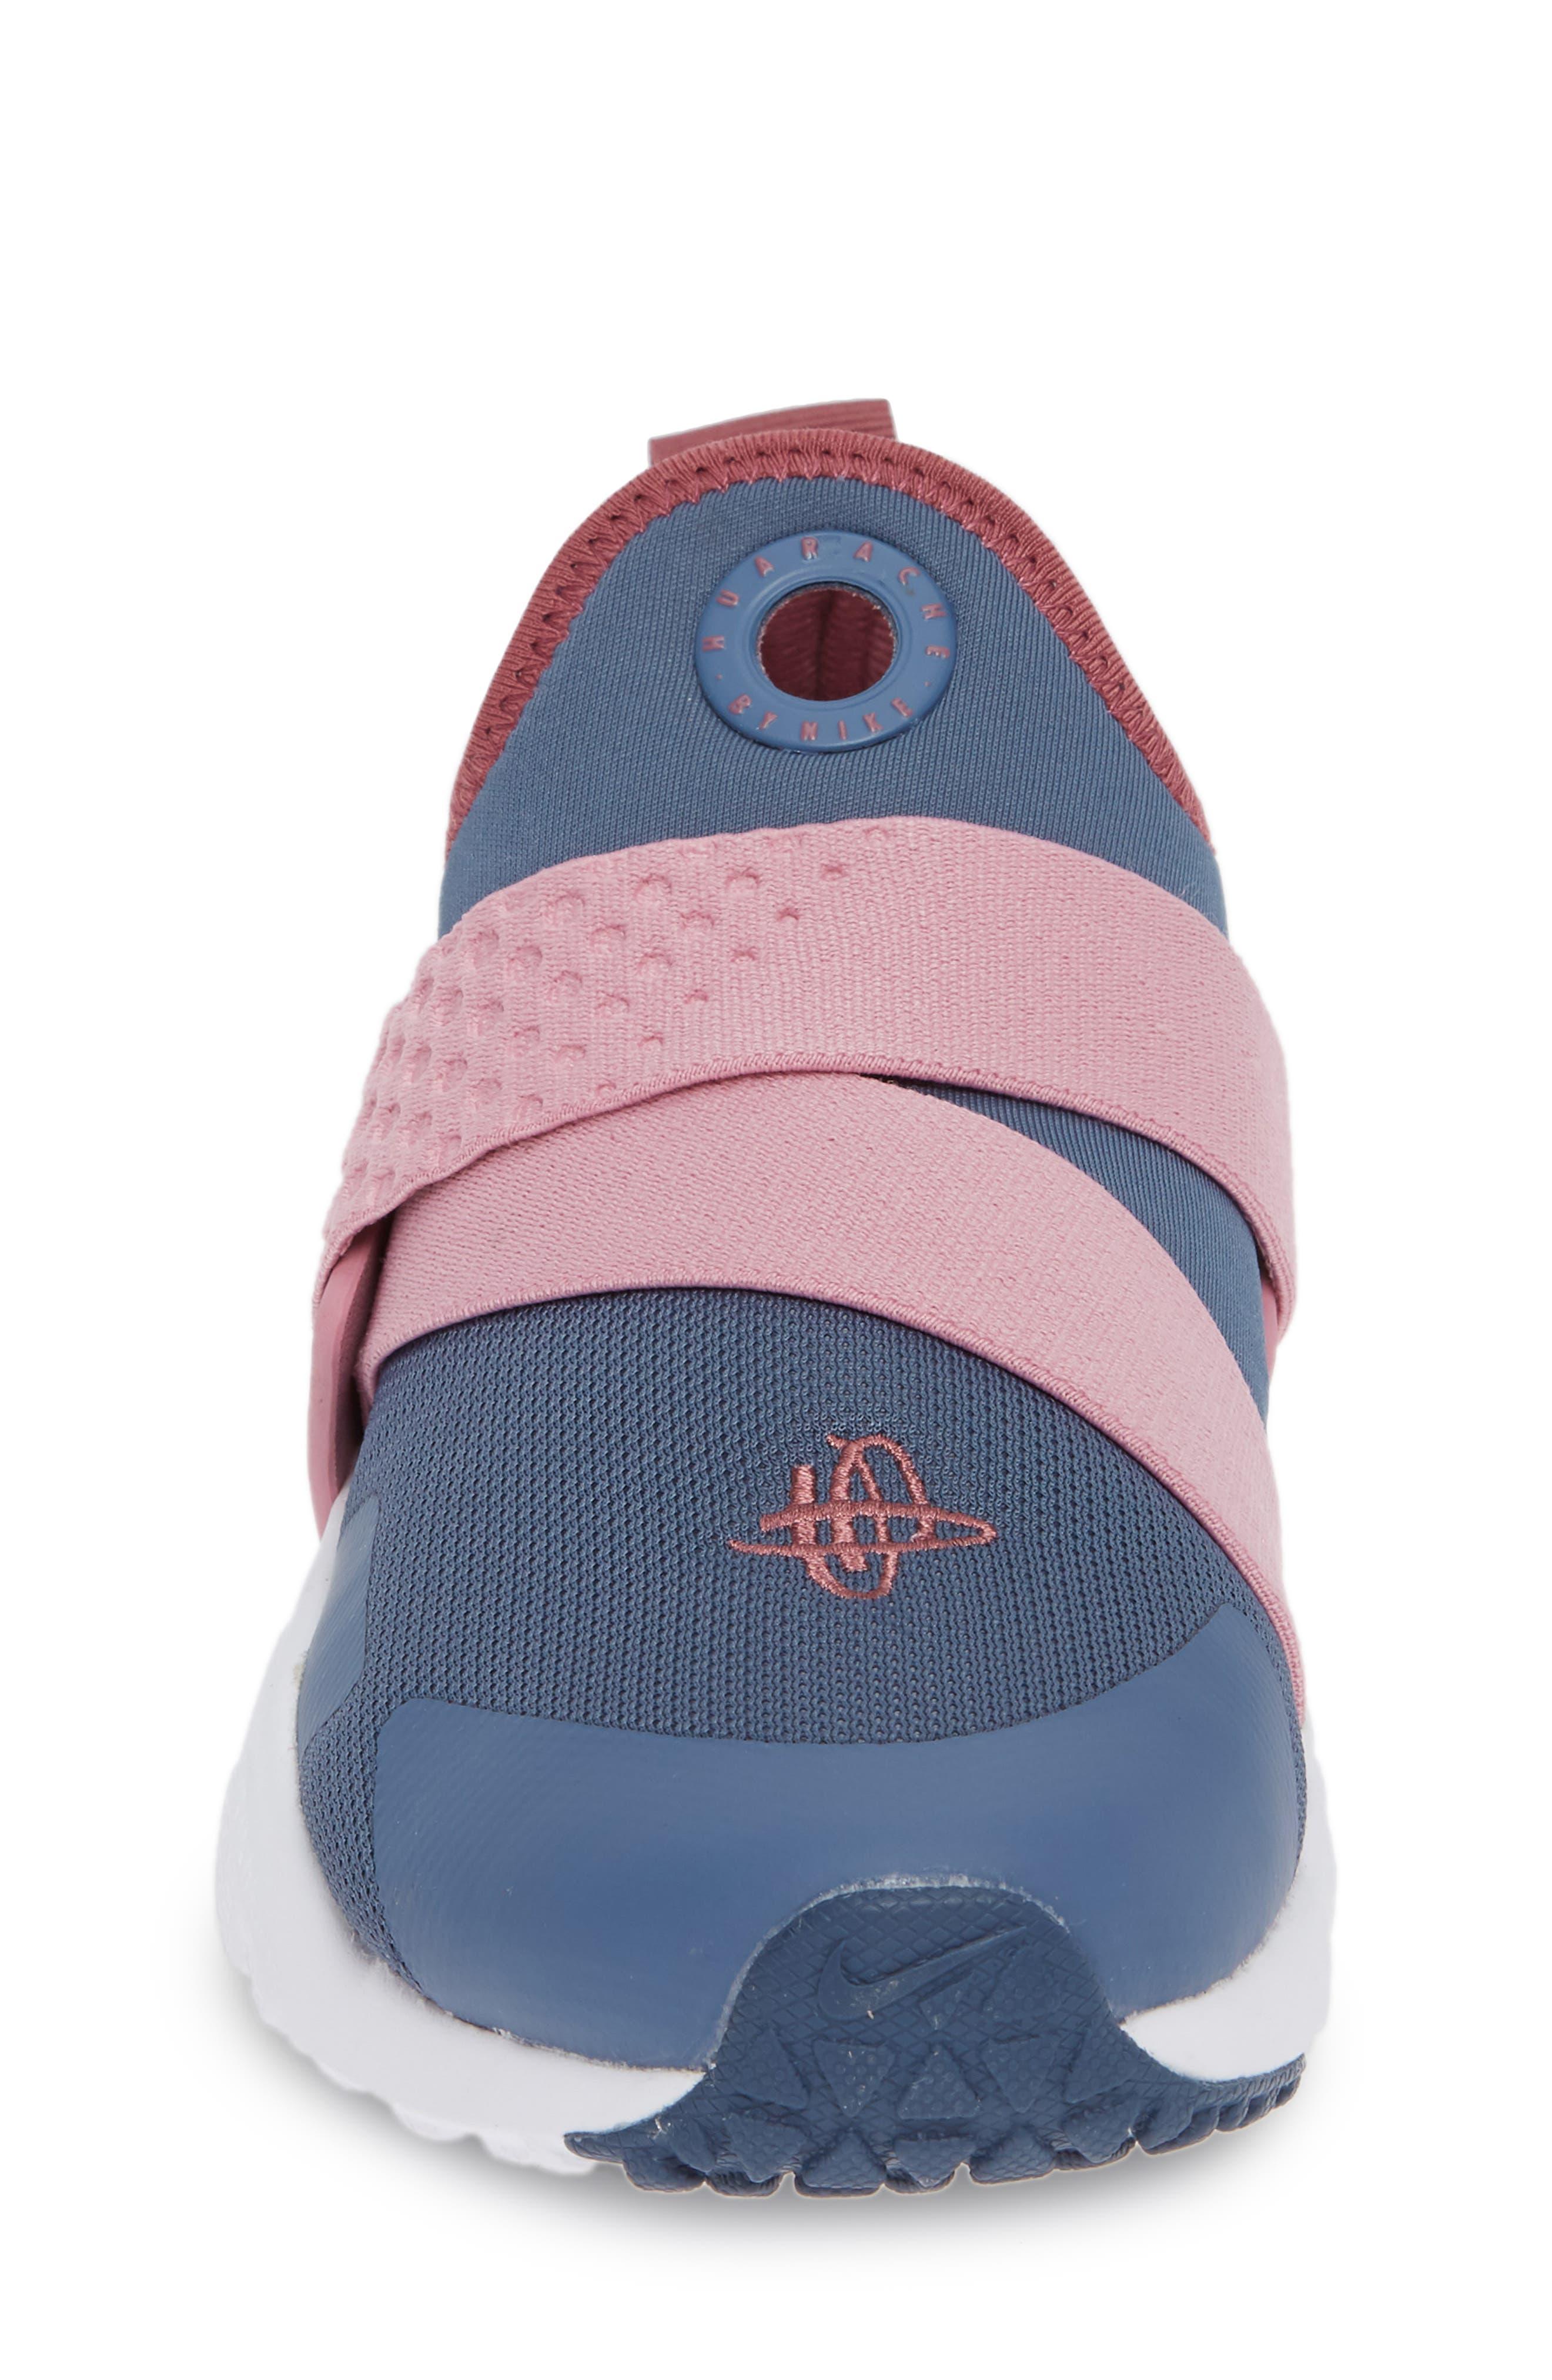 Huarache Extreme Sneaker,                             Alternate thumbnail 4, color,                             DIFFUSED BLUE